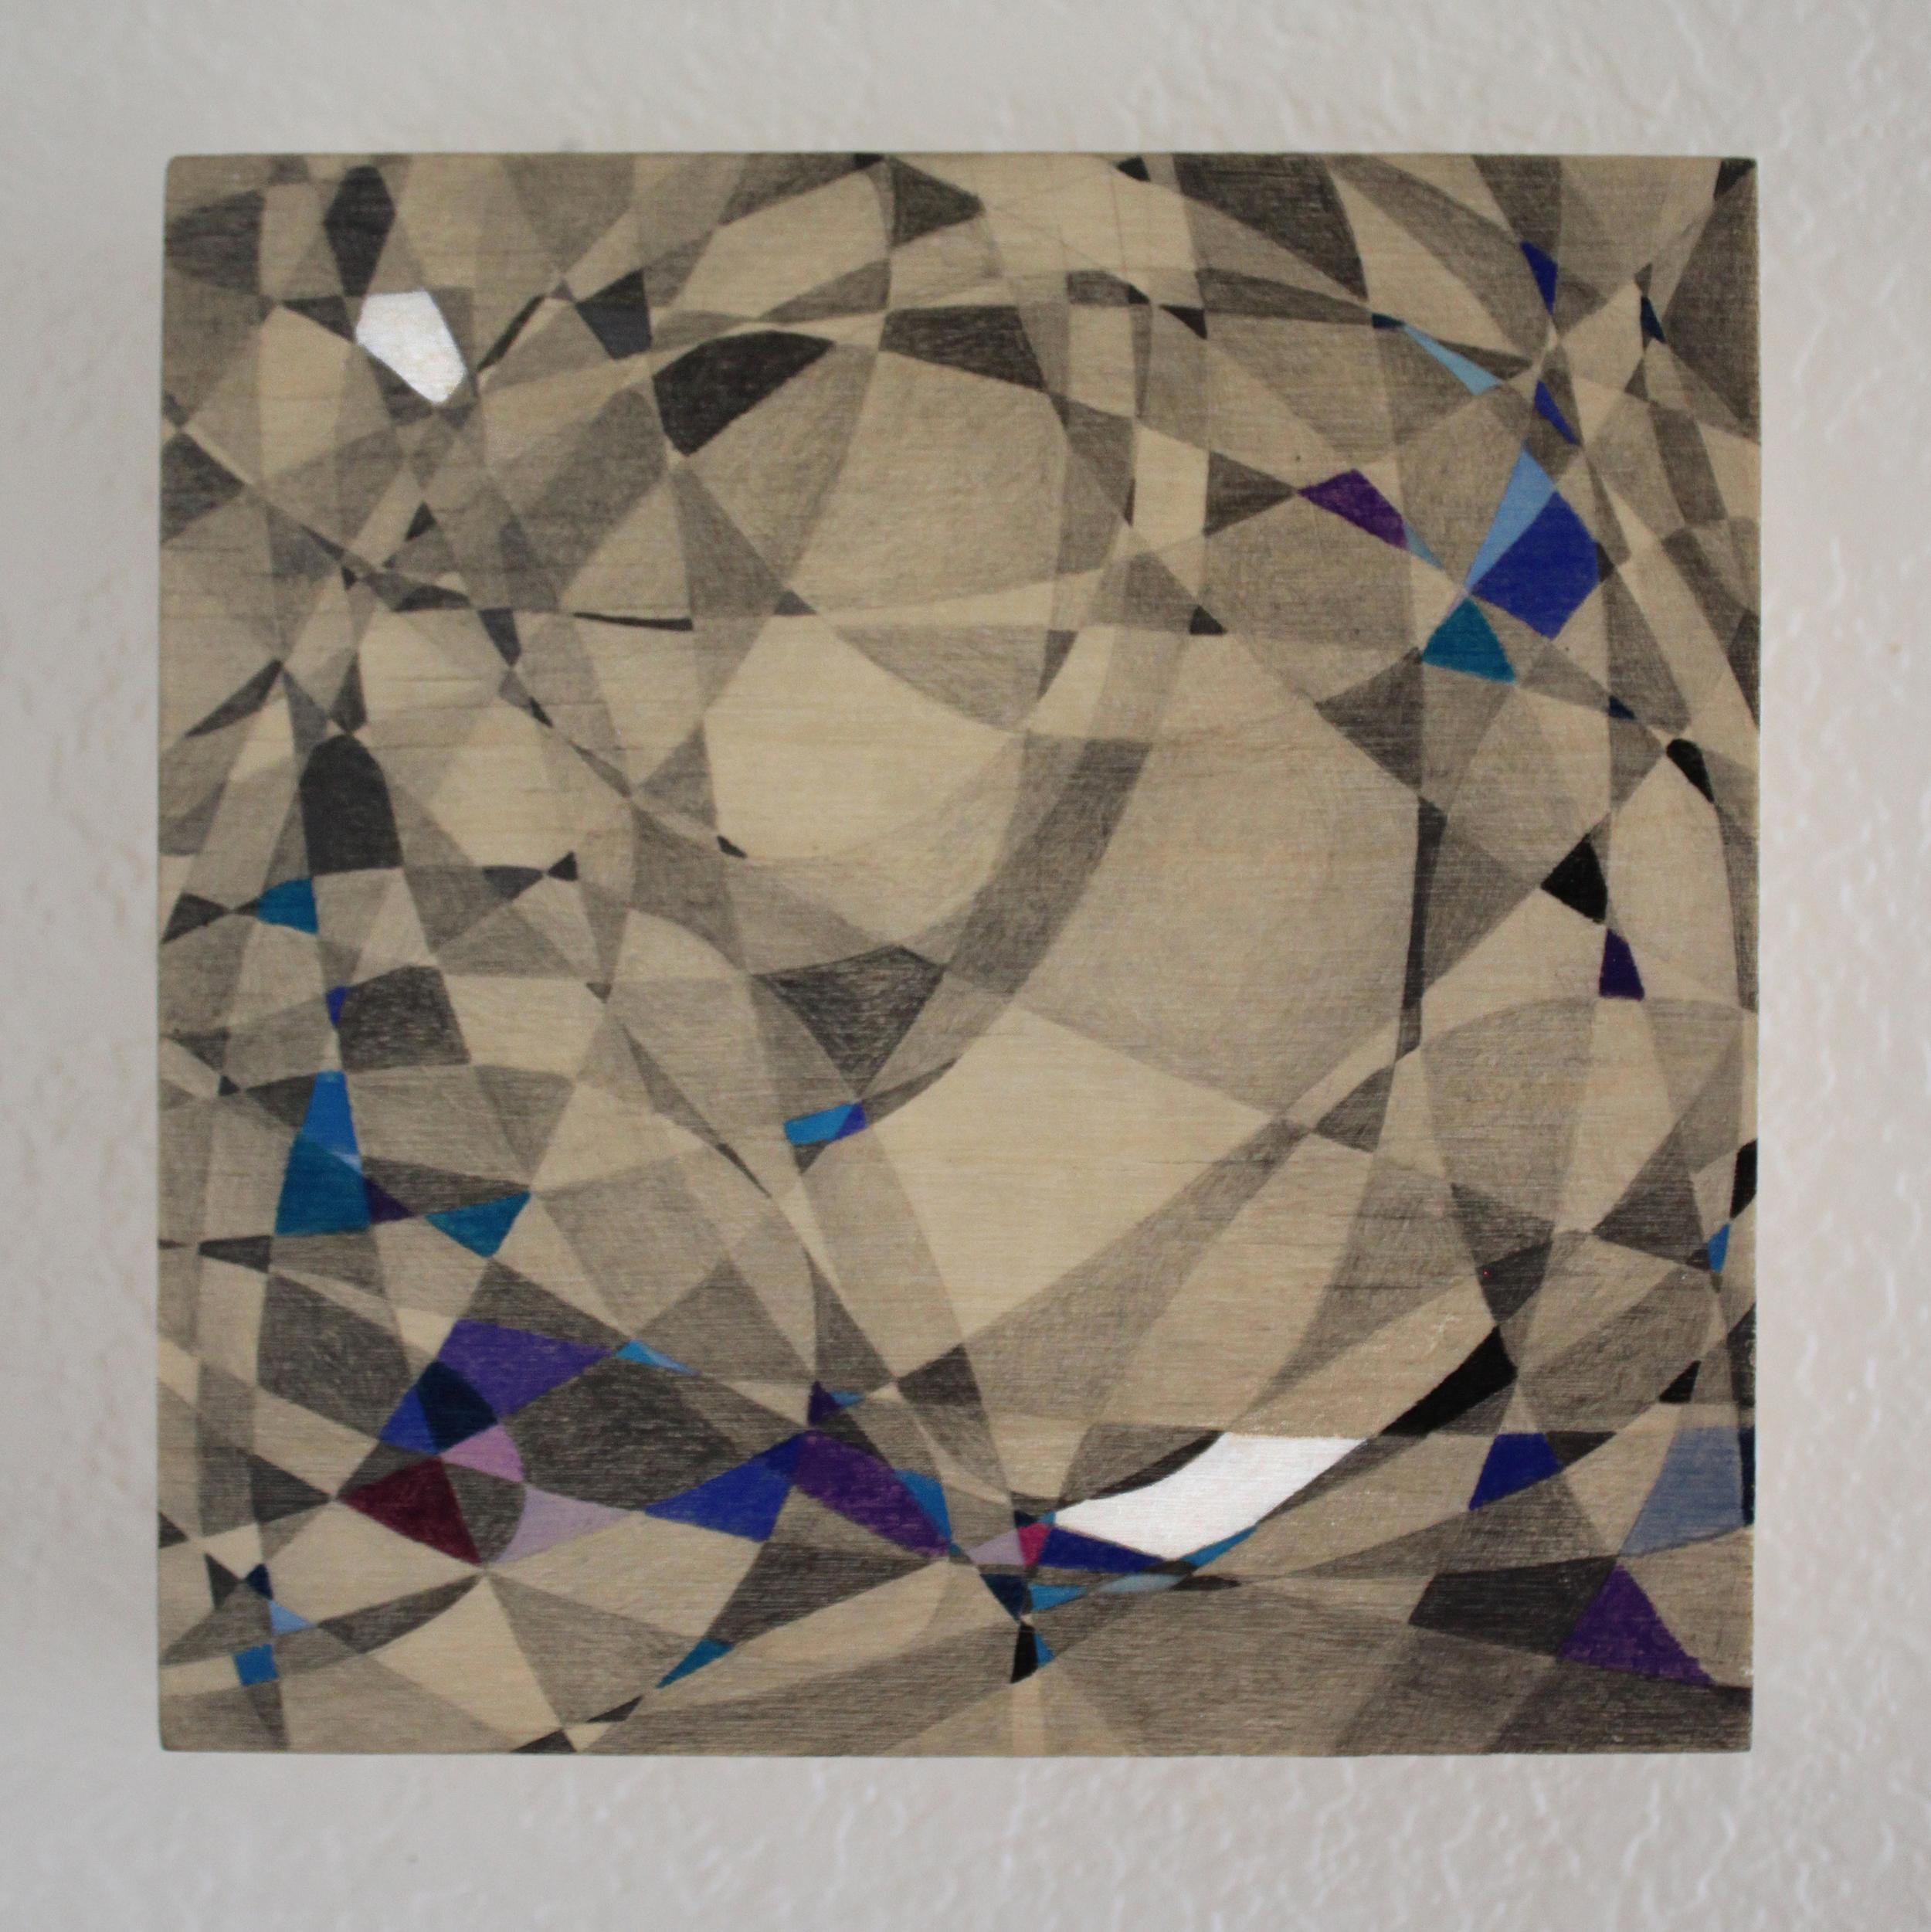 """Abstract II""Pencil on Panel, Resin, 6""x 6""2015 Boz Schurr"